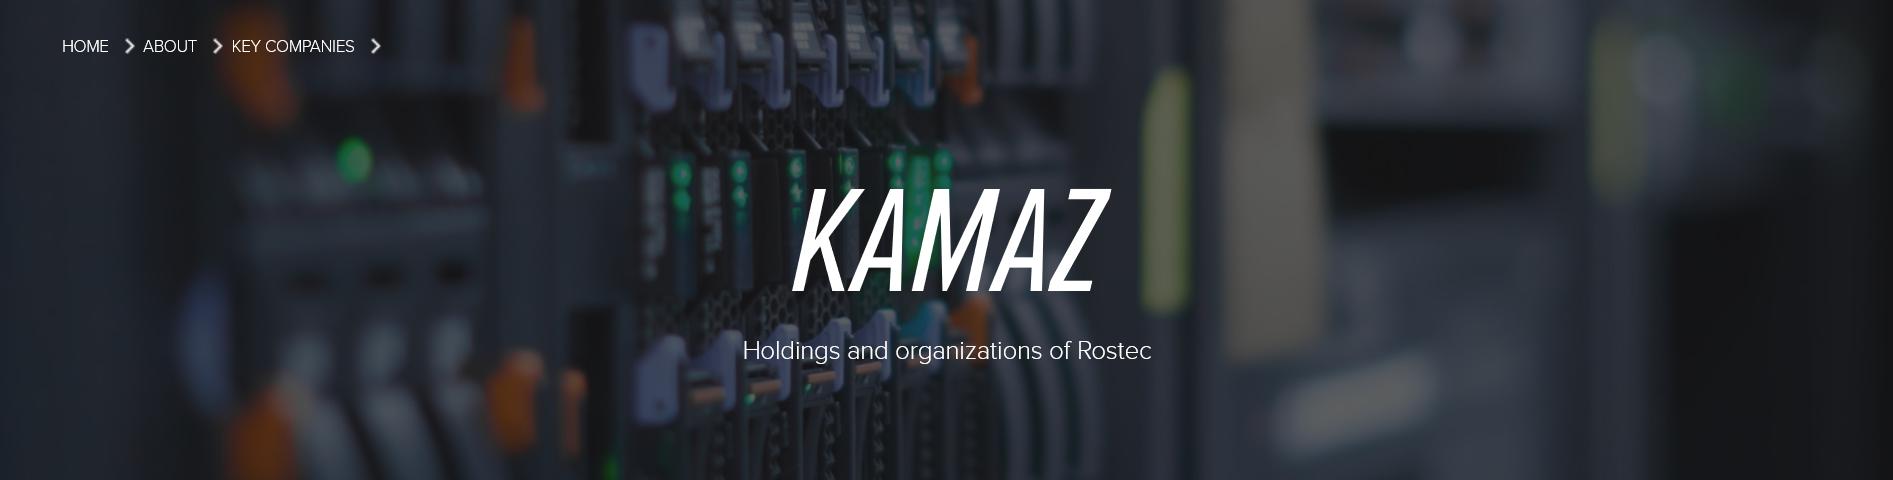 Kamaz Rostec.png